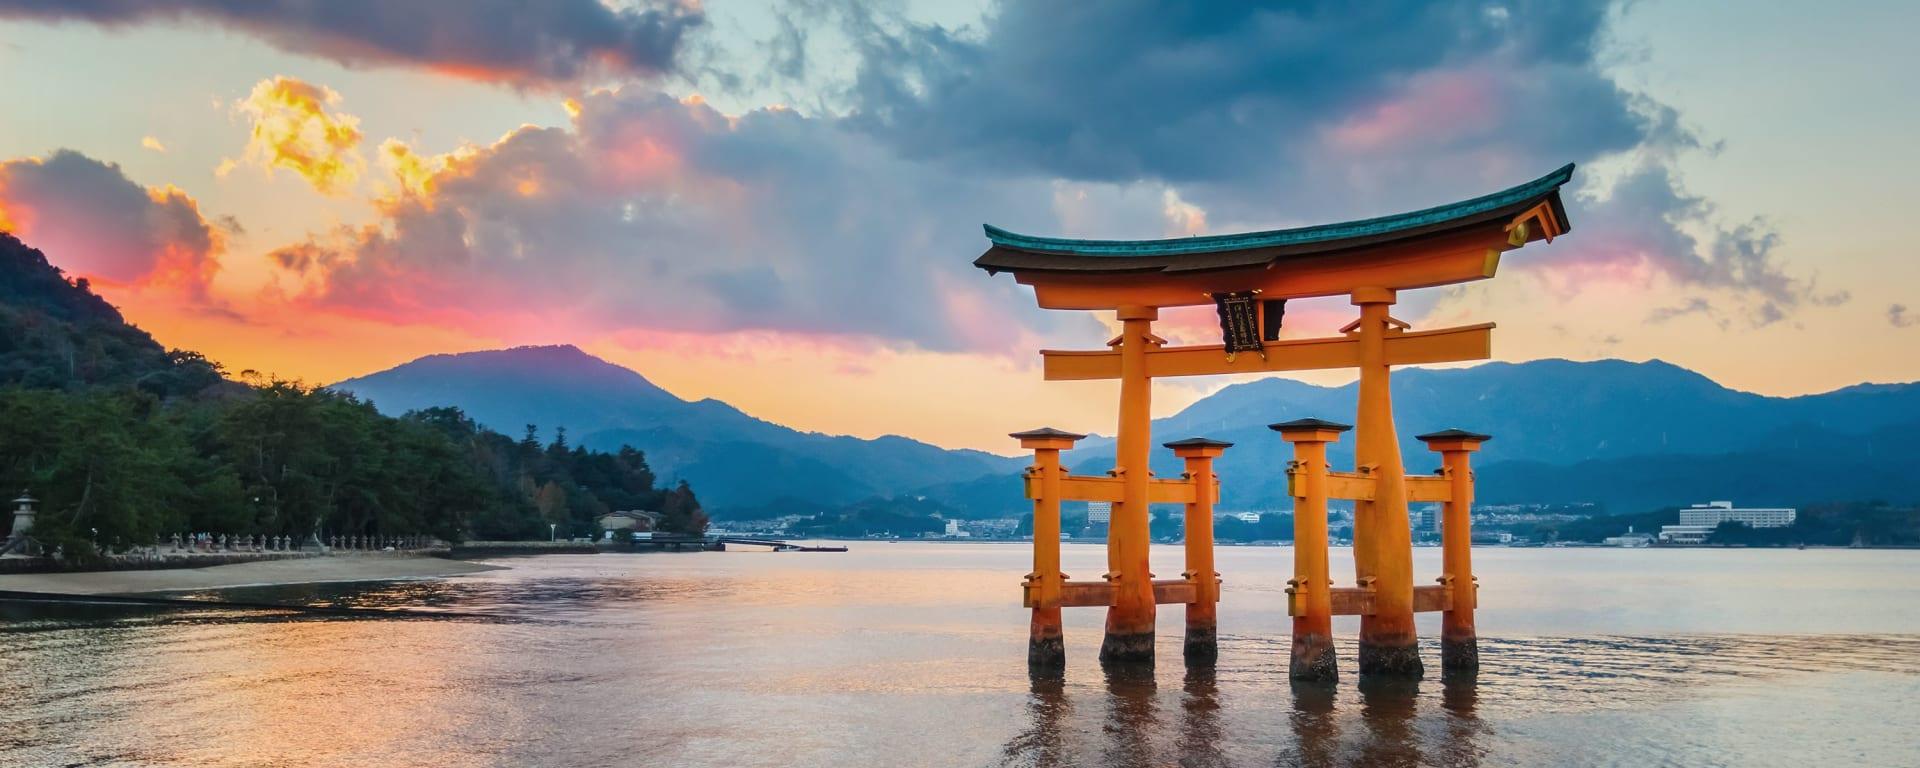 Japan entdecken mit Tischler Reisen: Japan Insel Miyajima Toori